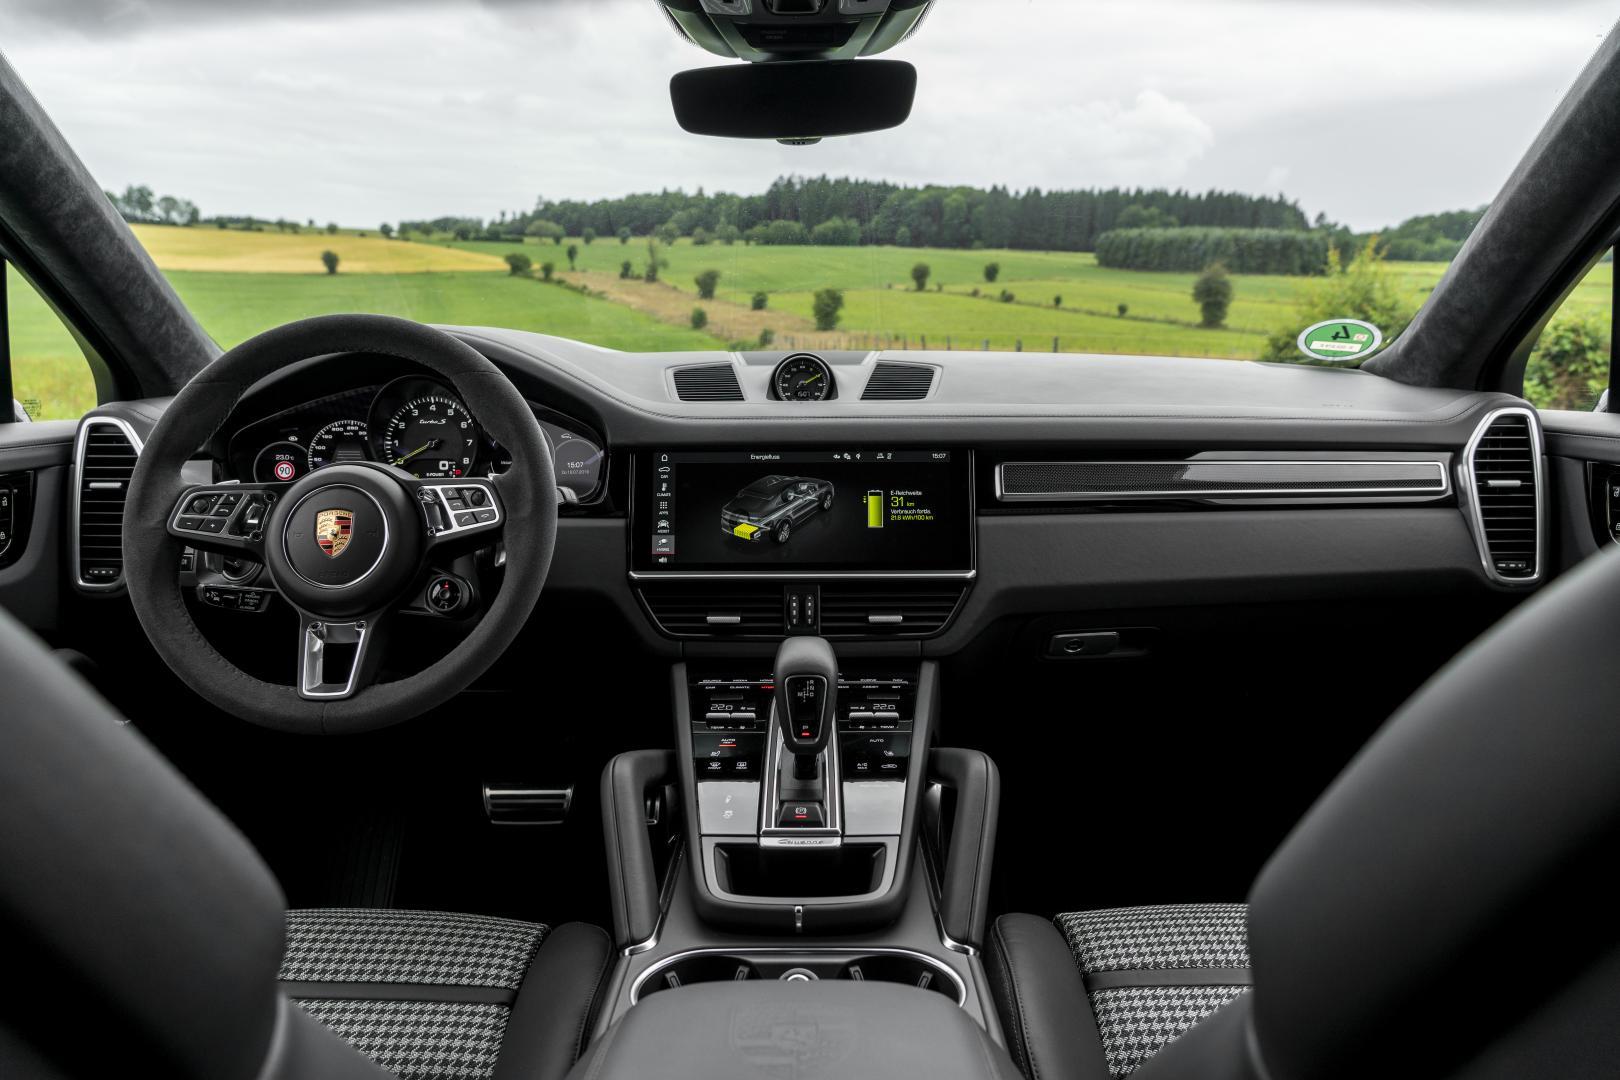 Porsche Cayenne Turbo S E-Hybrid interieur